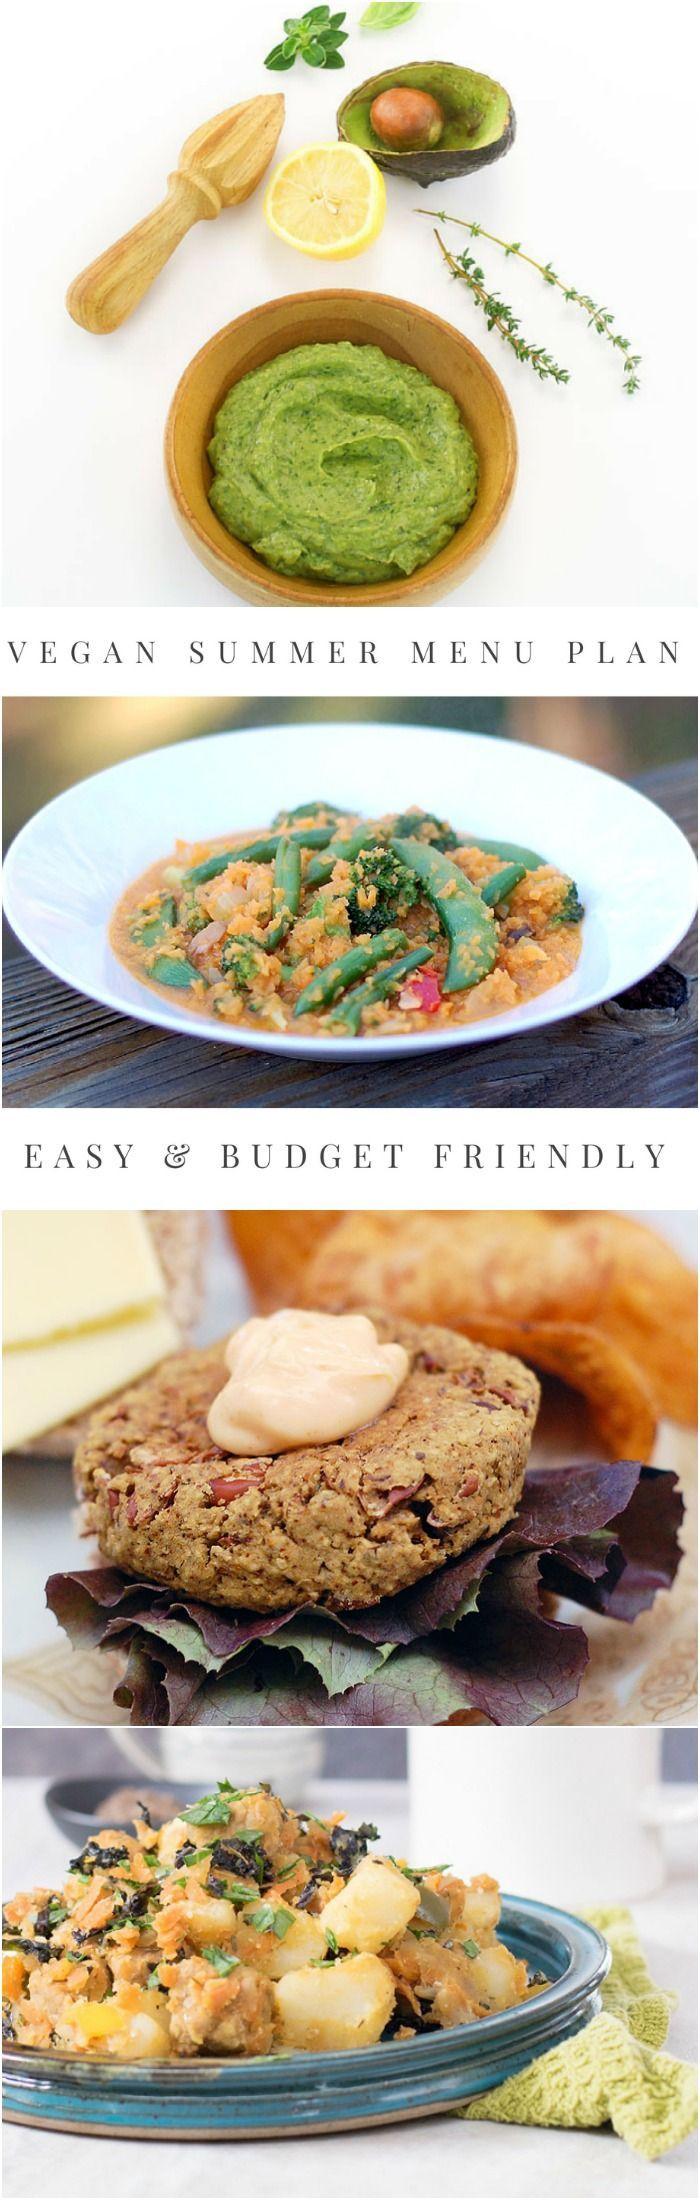 Quick And Easy Vegan Summer Menu Plan Full Of Veggies!  Cooking